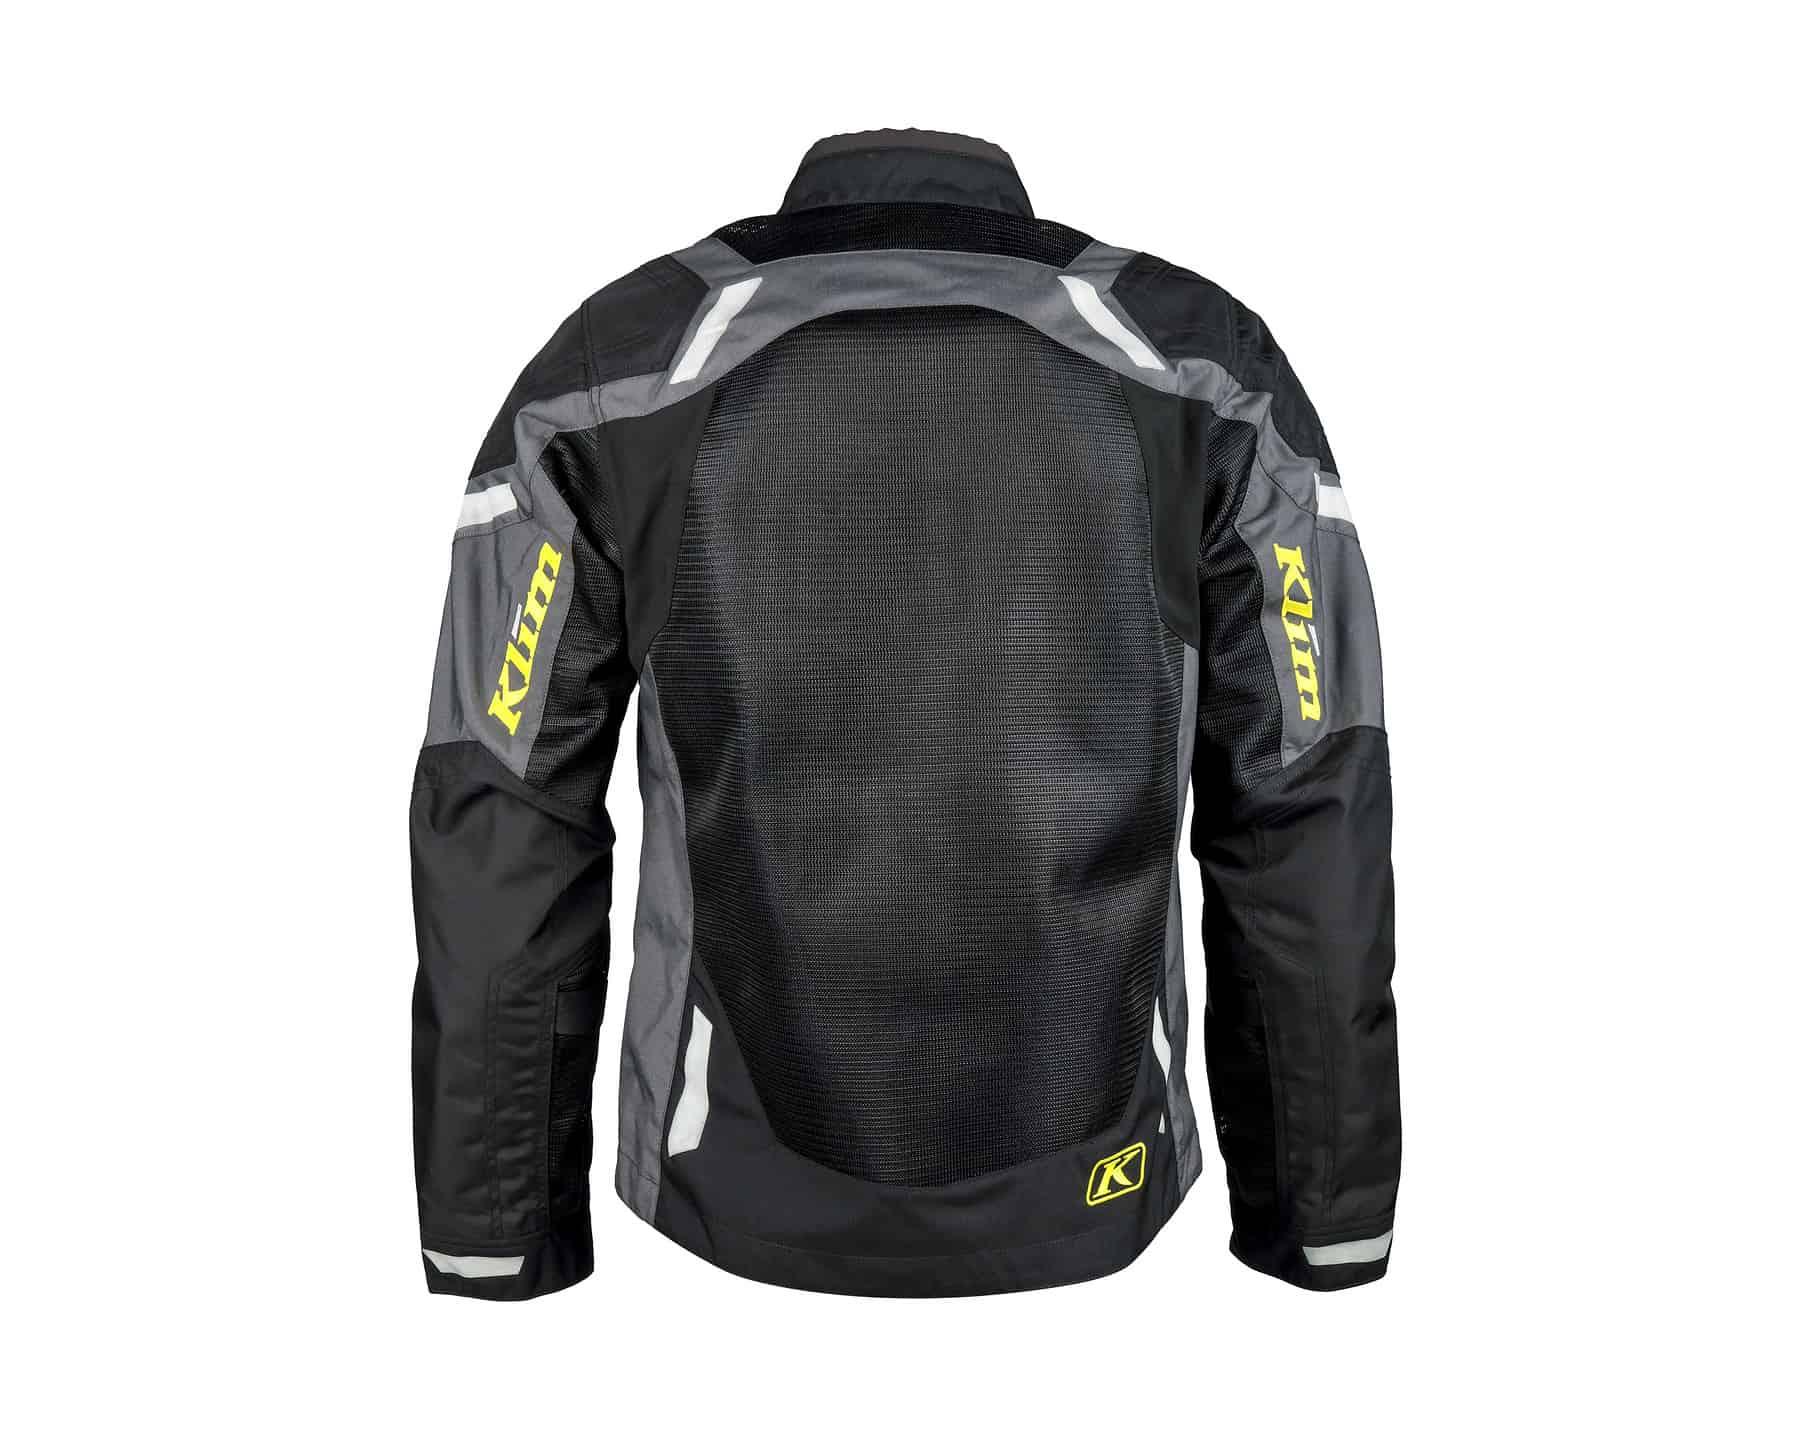 Induction Jacket_5060-002_Dark Gray_04